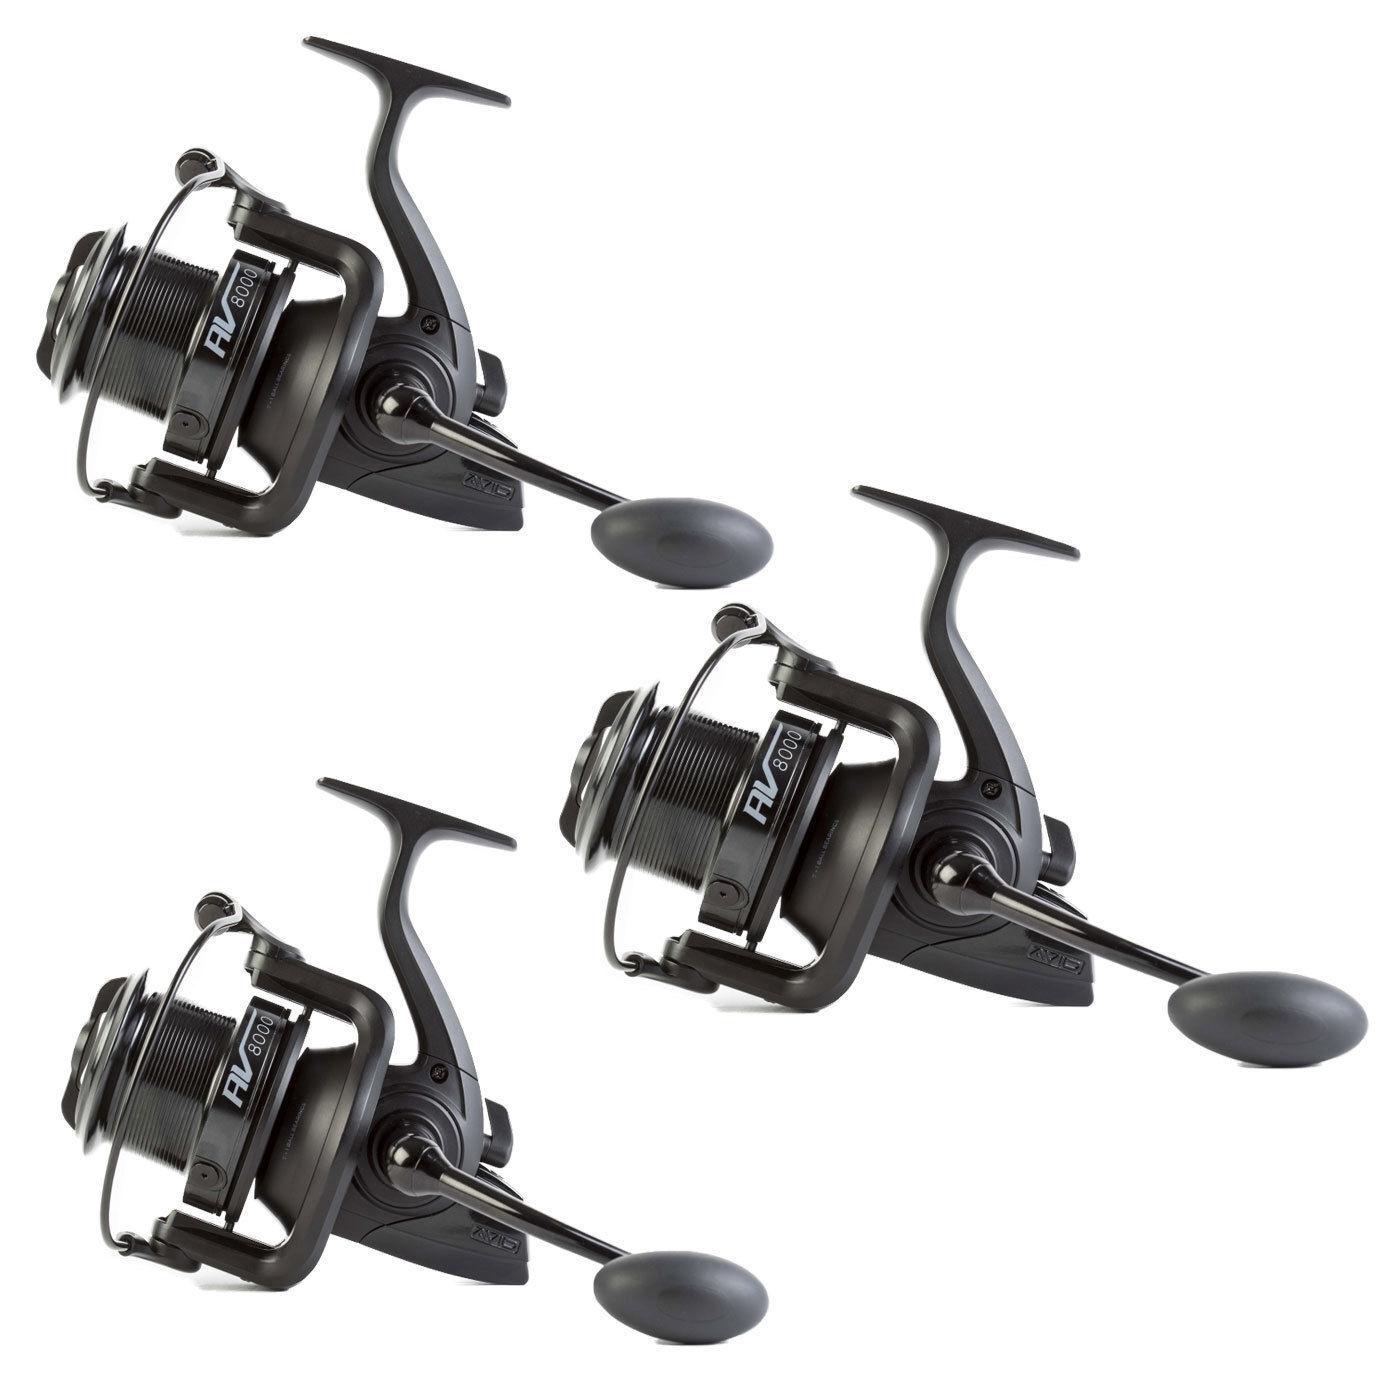 3 x Avid Carp AV8000 Compact Fishing Reel A047003